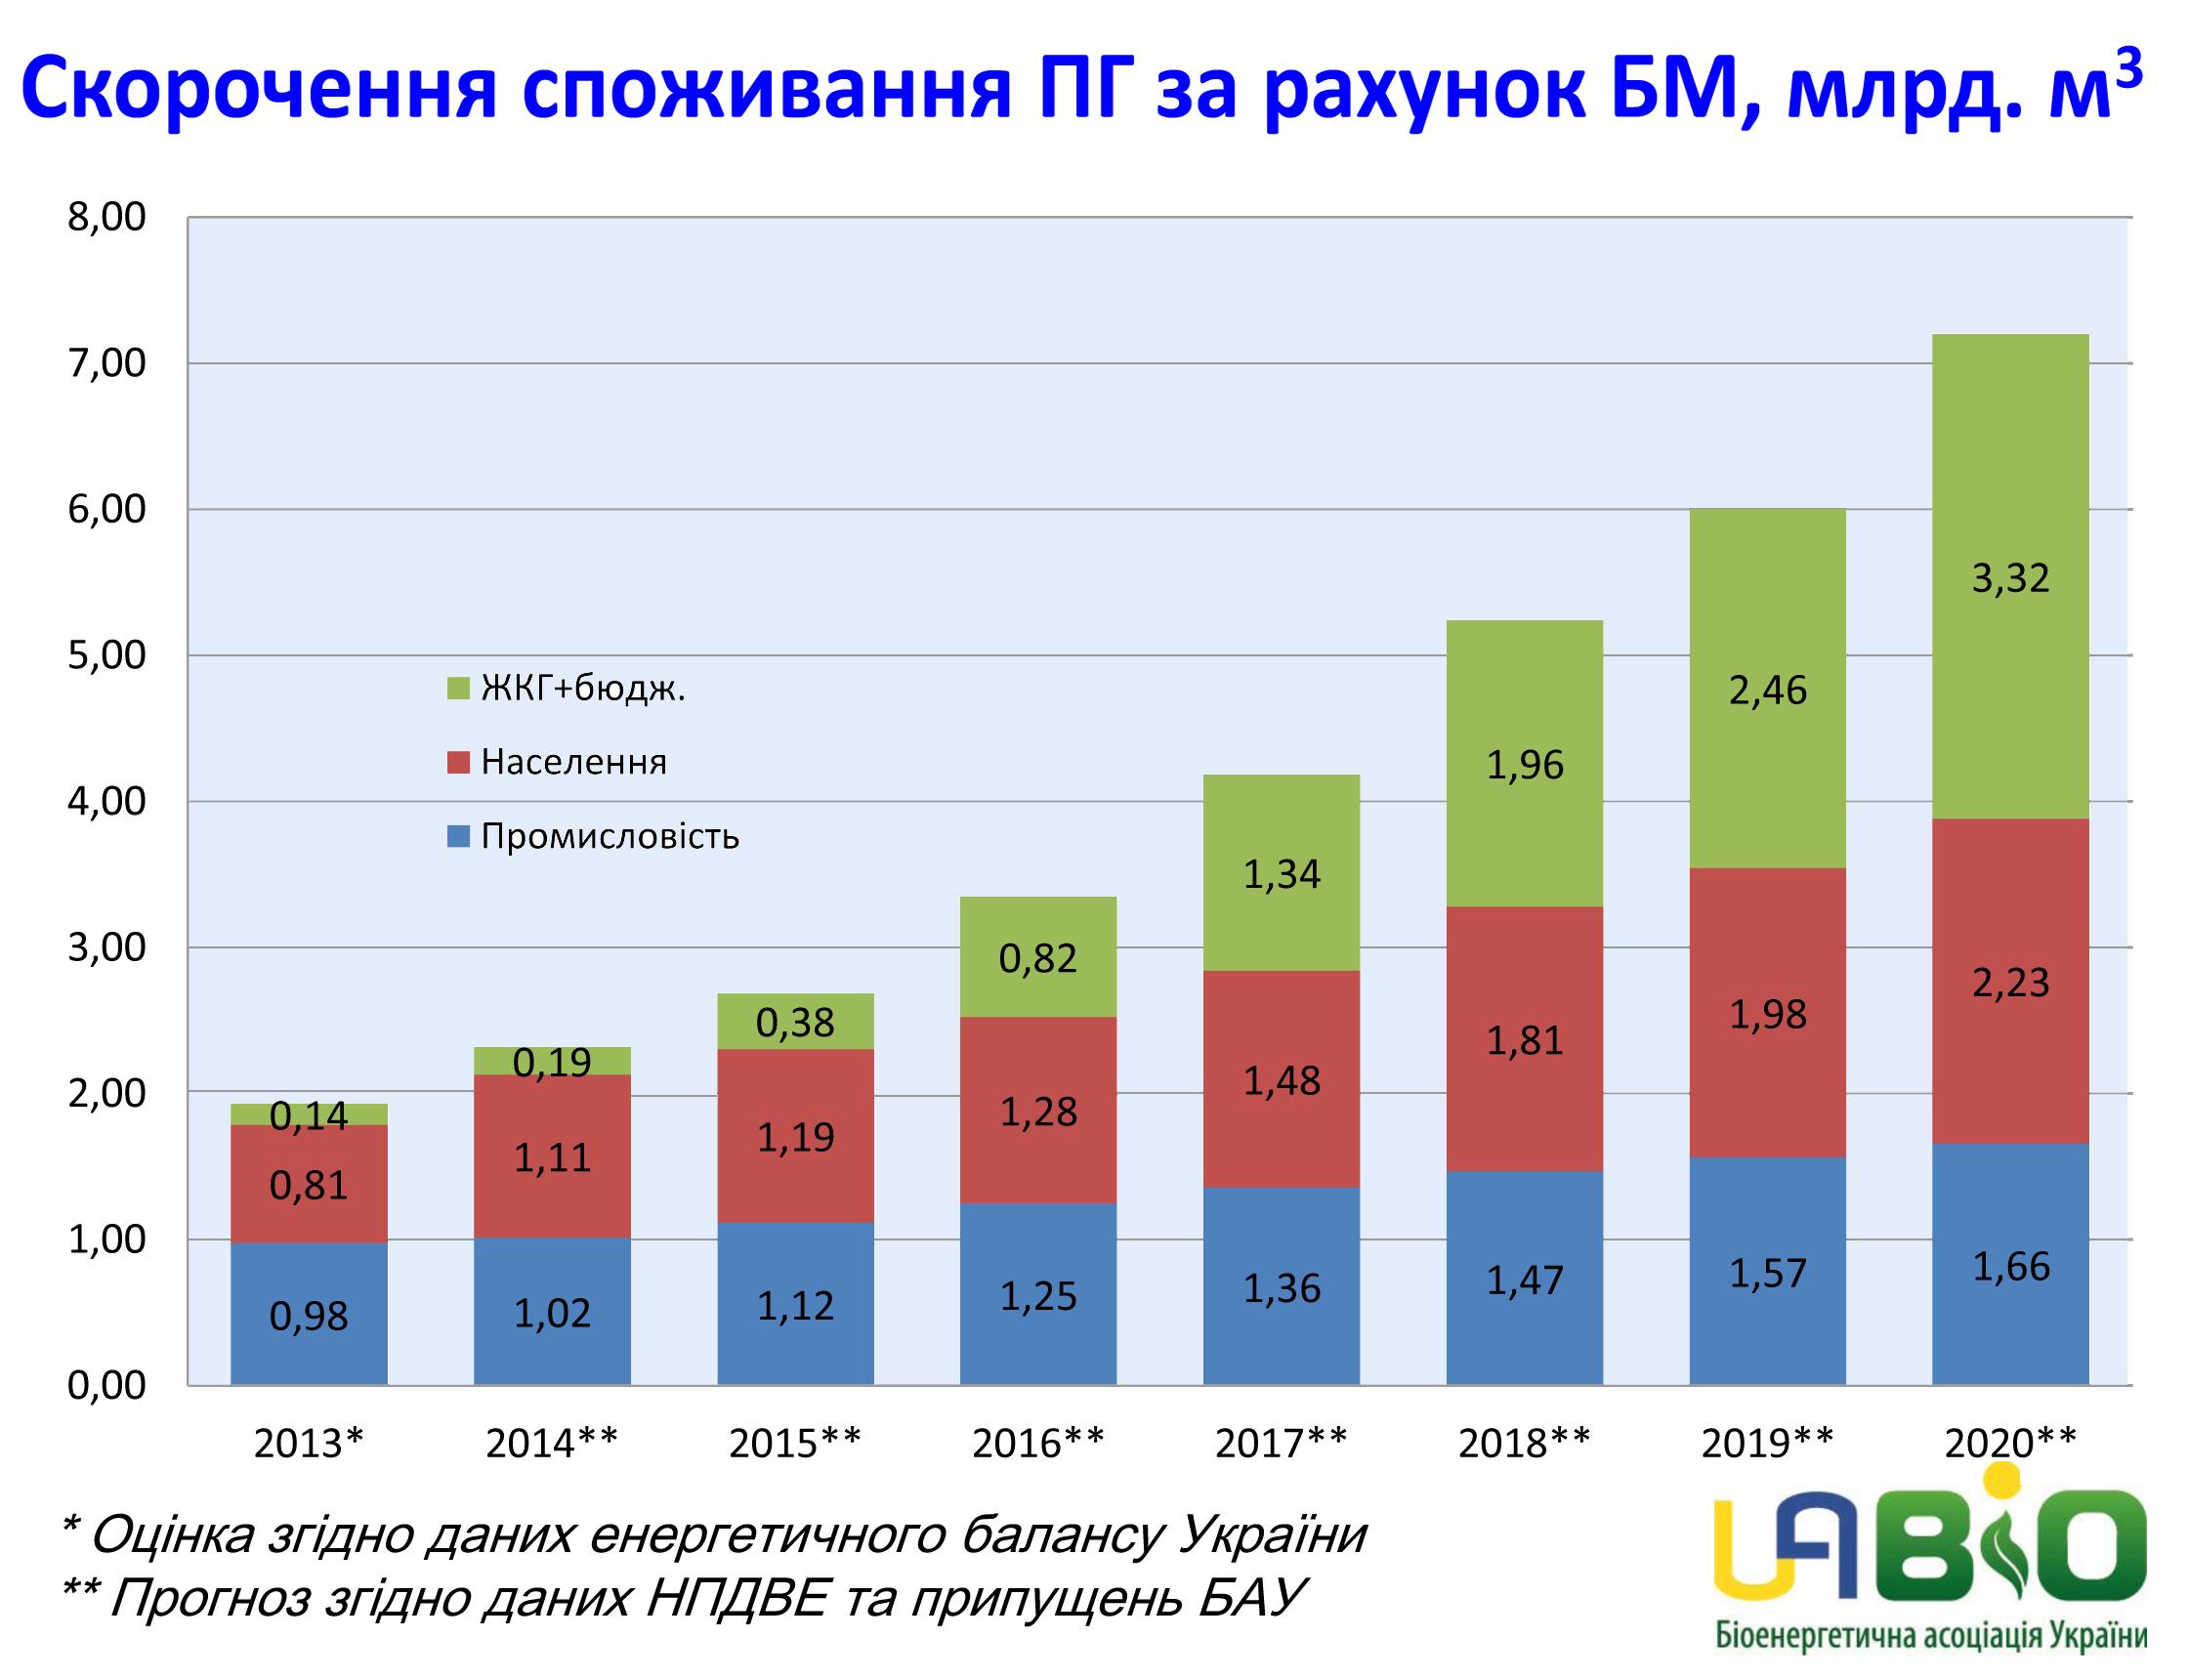 potencial_zamishennya_prirodnogo_gazy_biopalivom.jpg